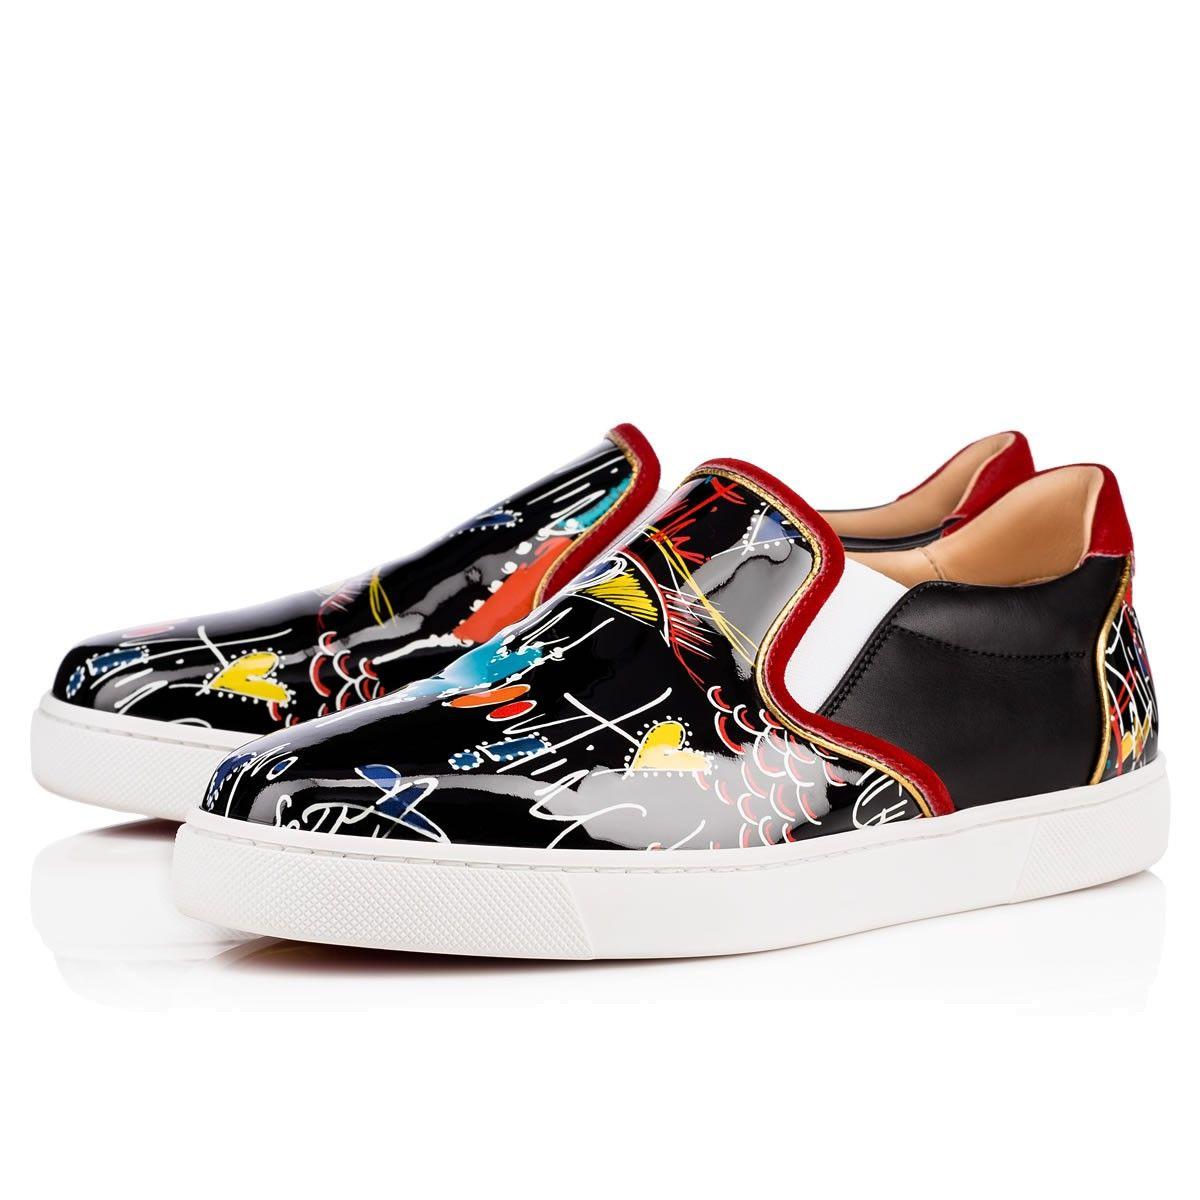 a078554def52 CHRISTIAN LOUBOUTIN Masteralta Flat.  christianlouboutin  shoes ...